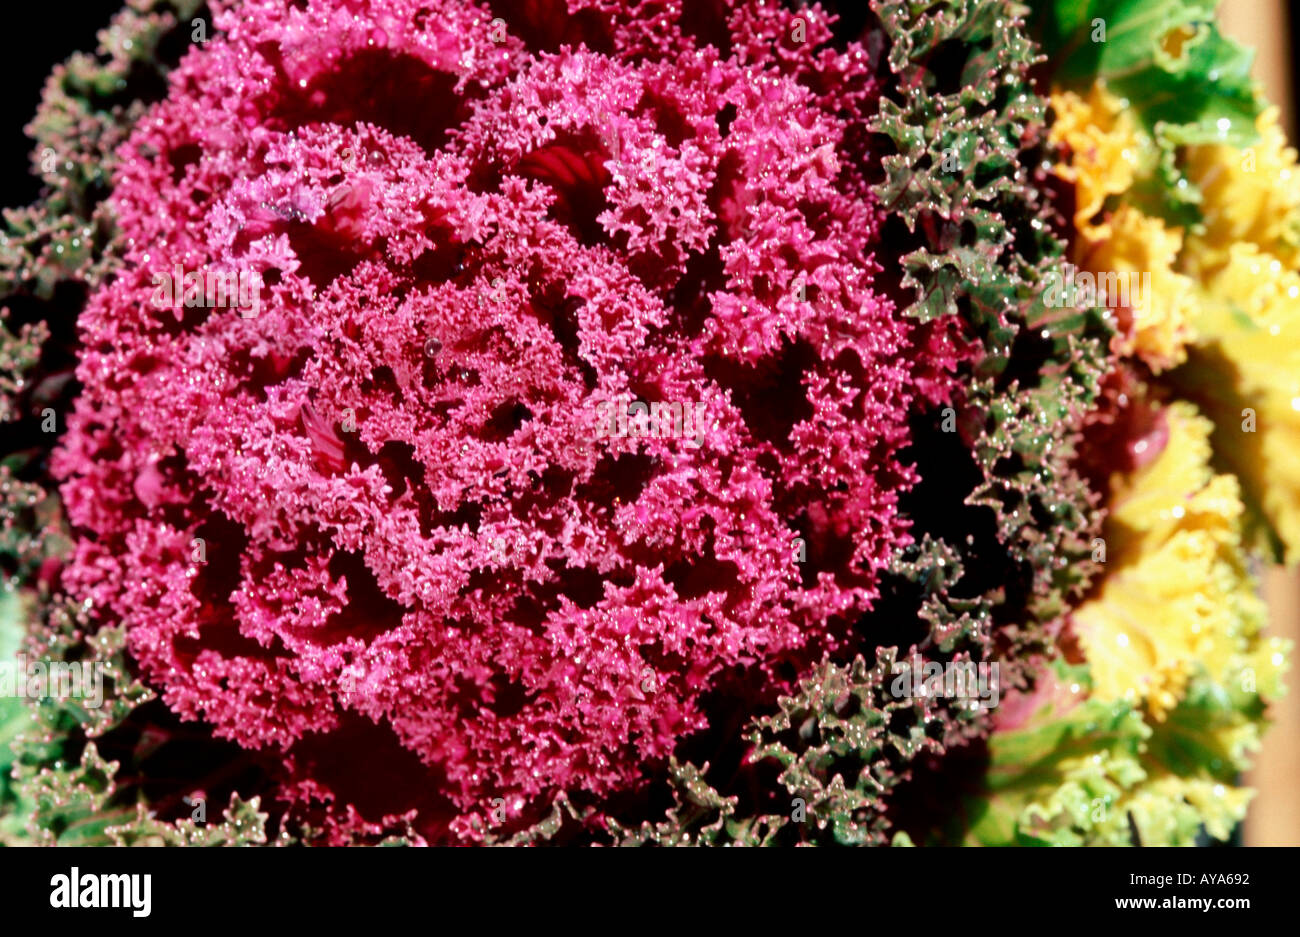 Gartenpflanzen  Ornamental Cabbage Brassica aleracea var cruciferae Zierkohl Stock ...